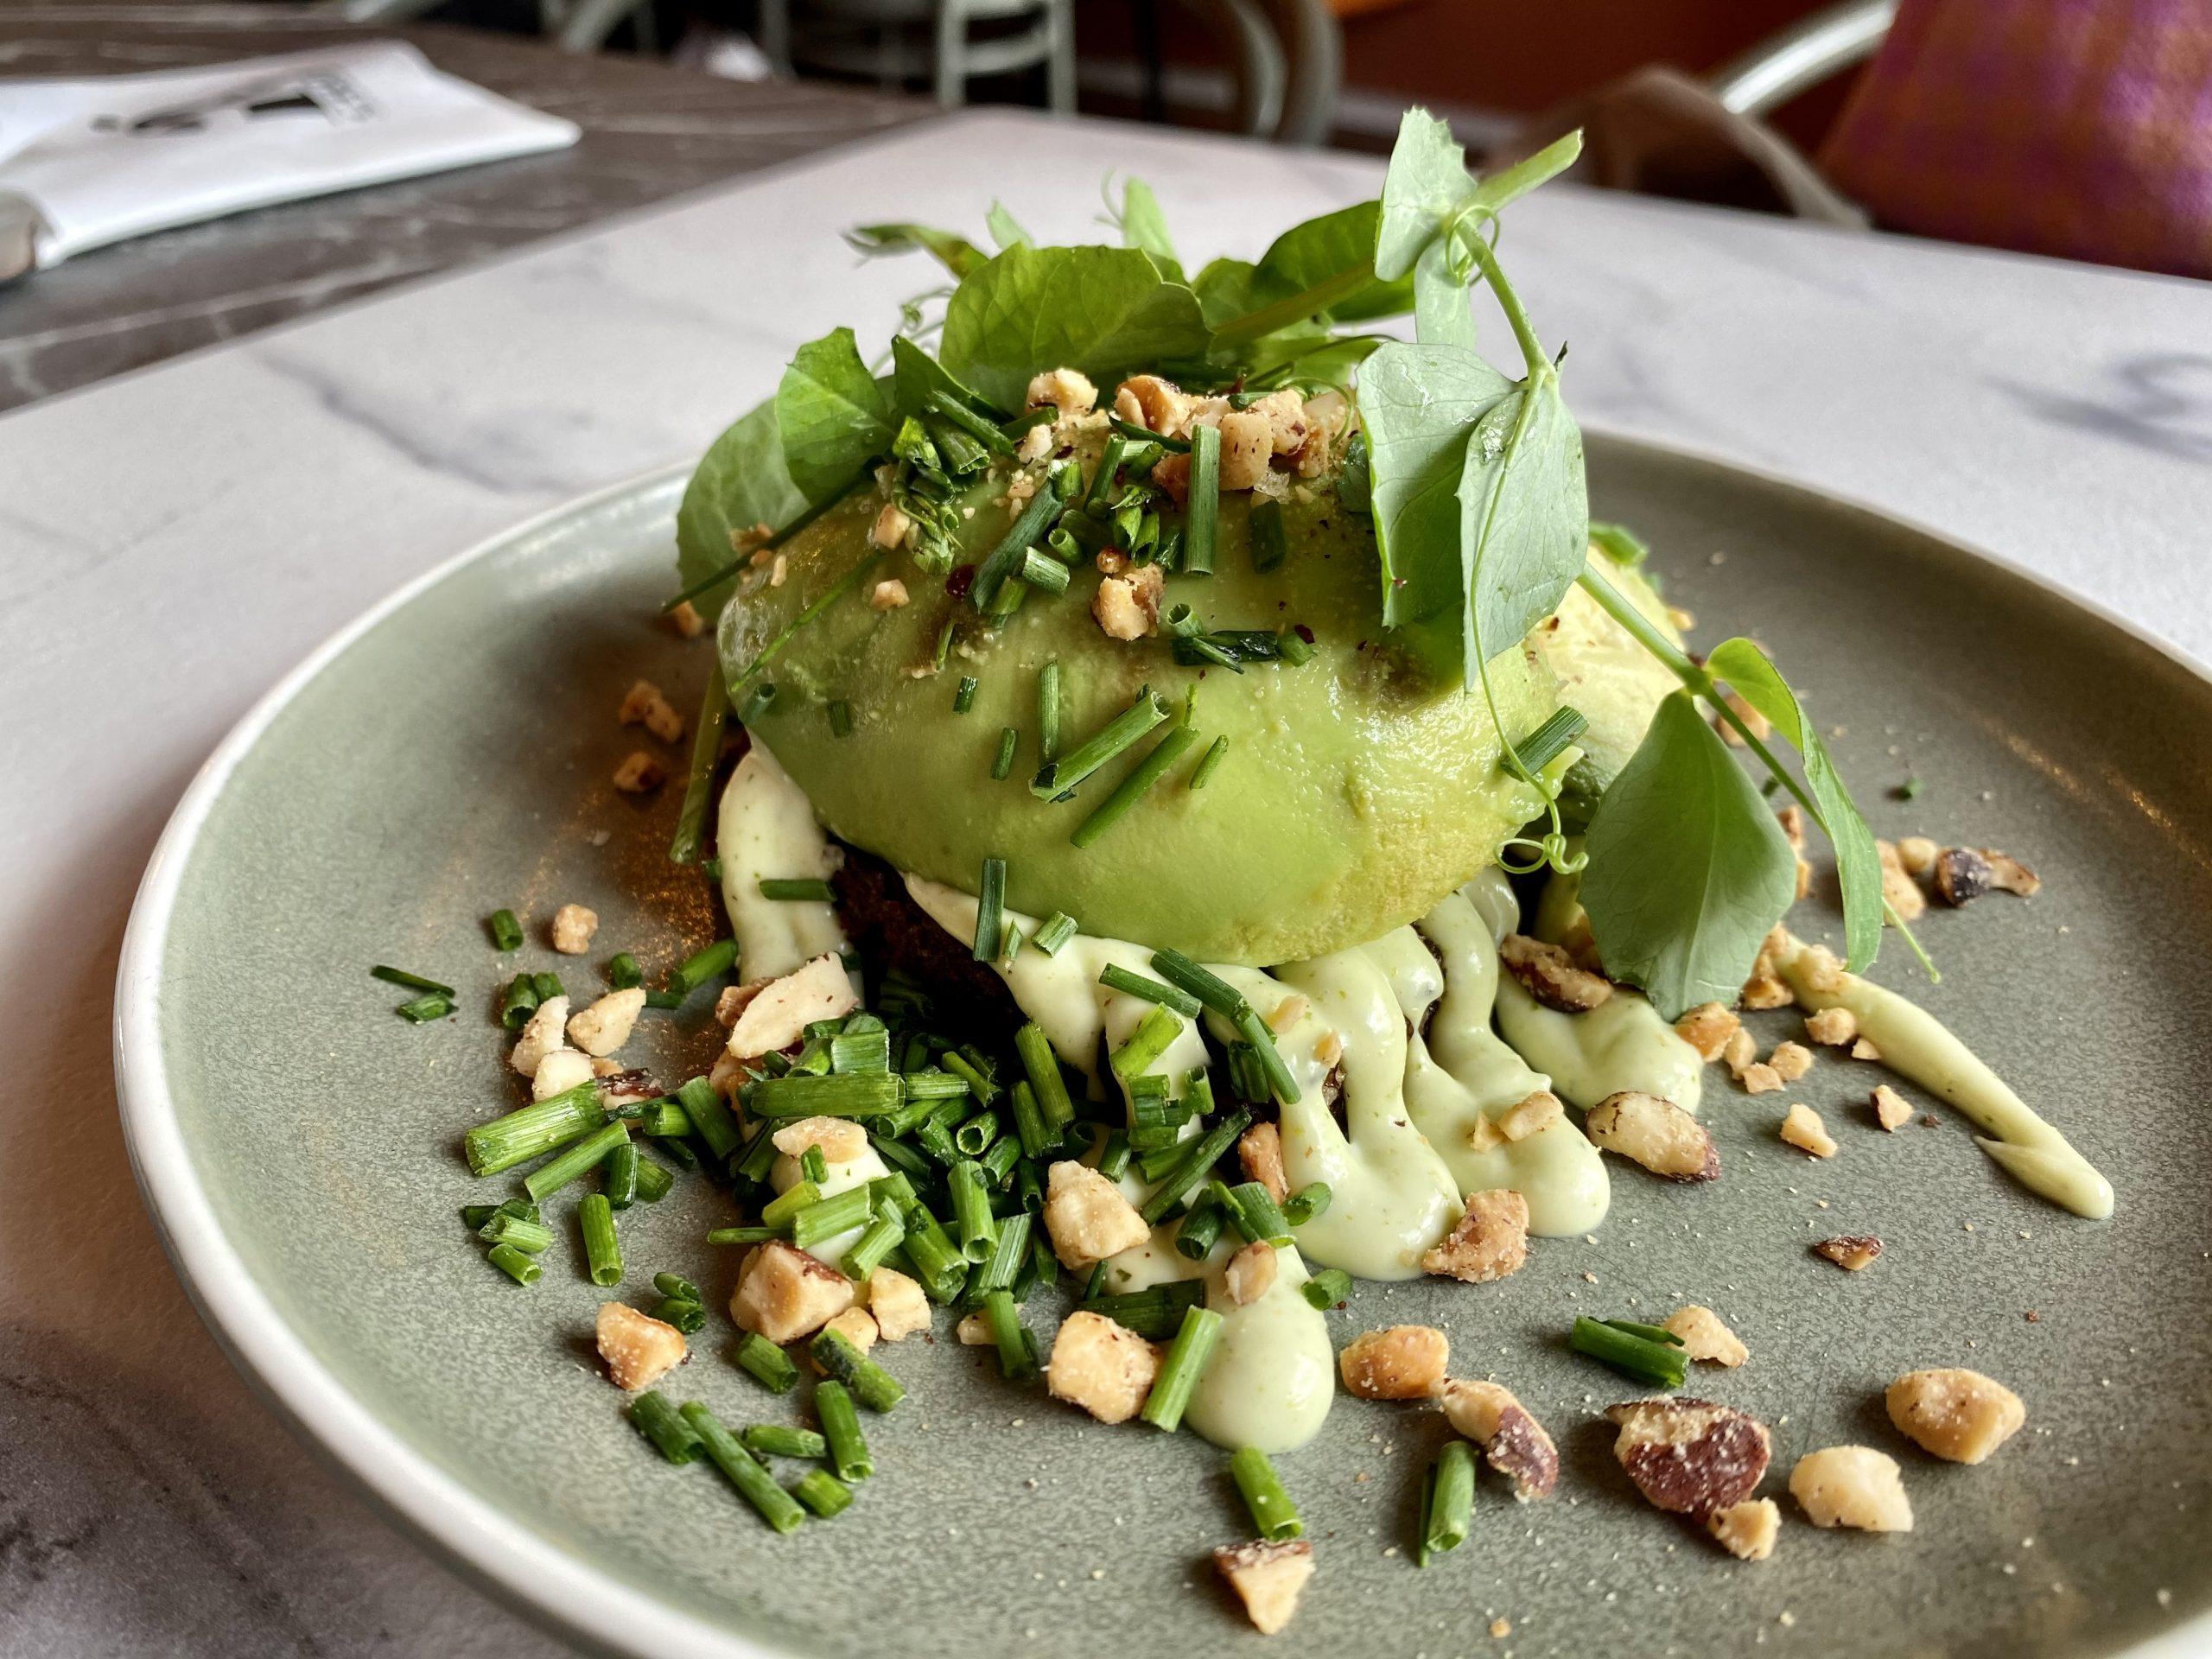 Pænt og lækkert: Her er 5 skarpe avocadomadder i Aarhus